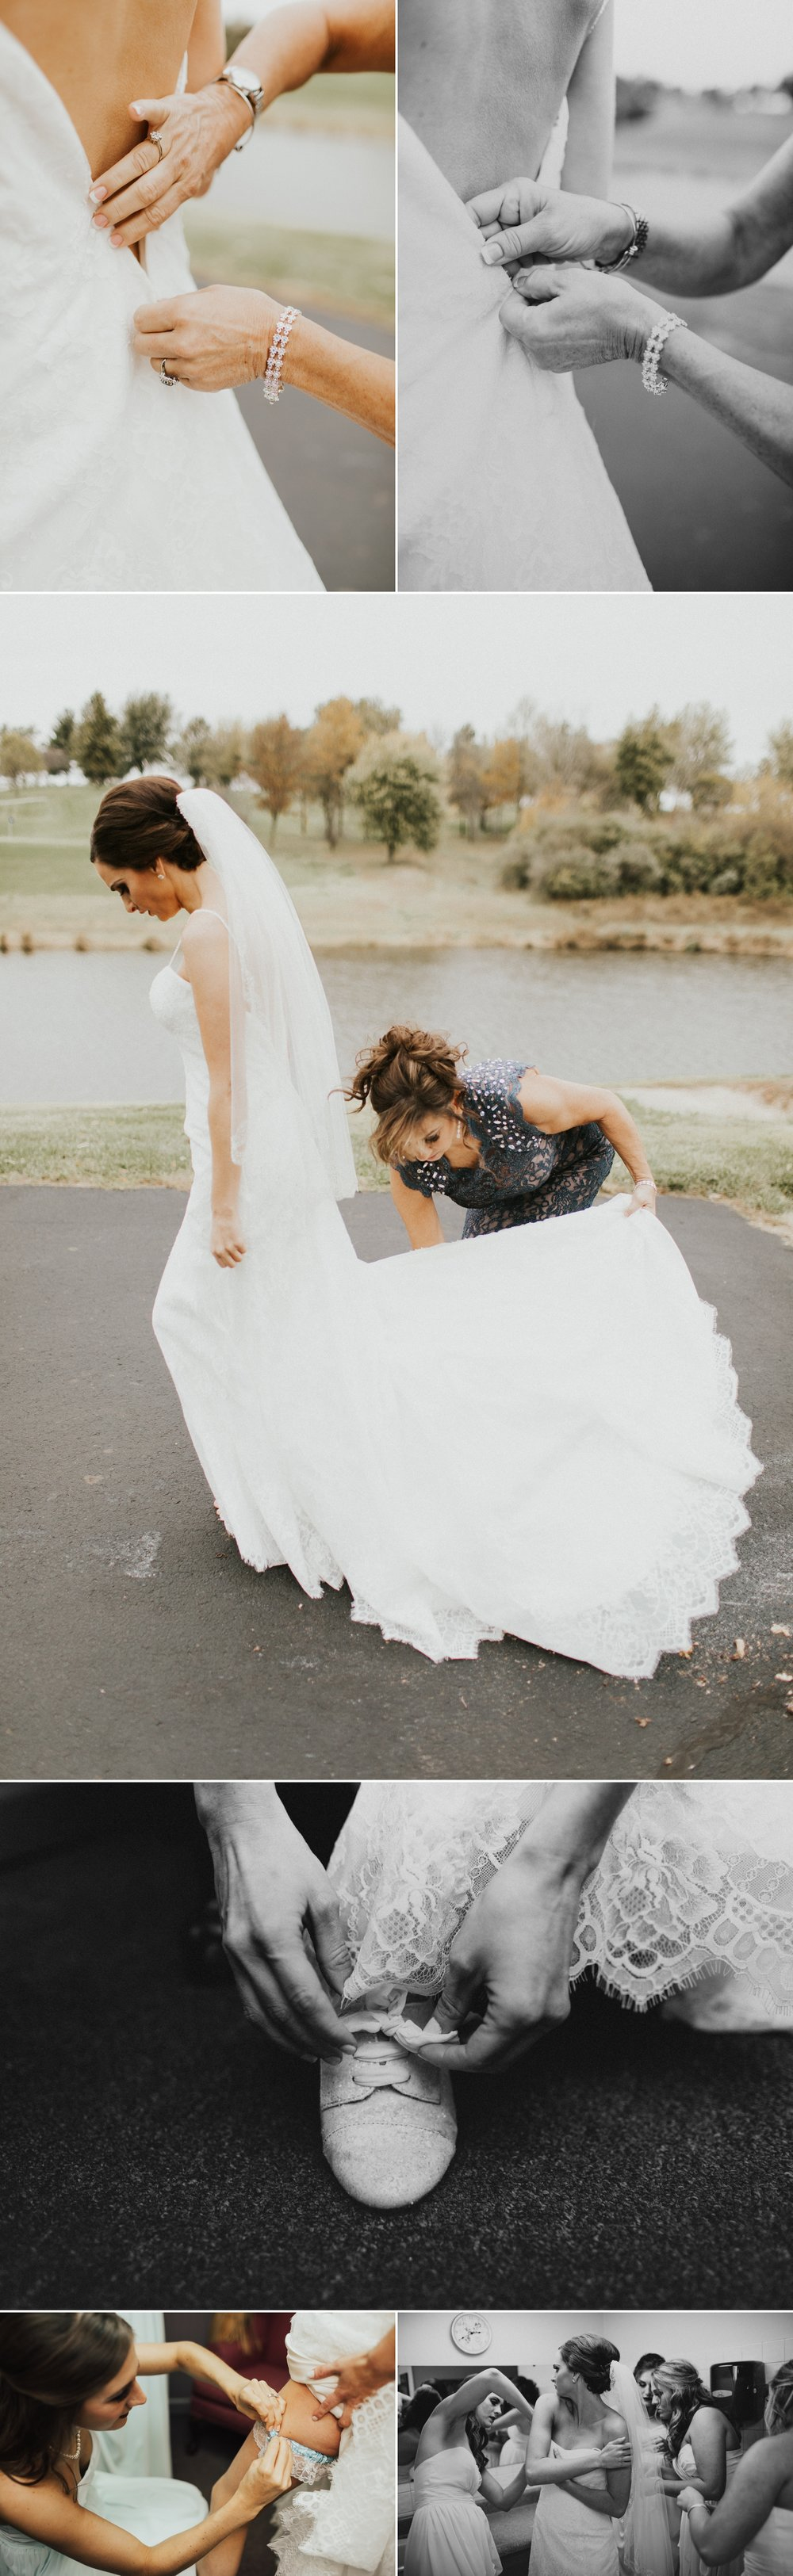 The Ault Wedding 1.jpg